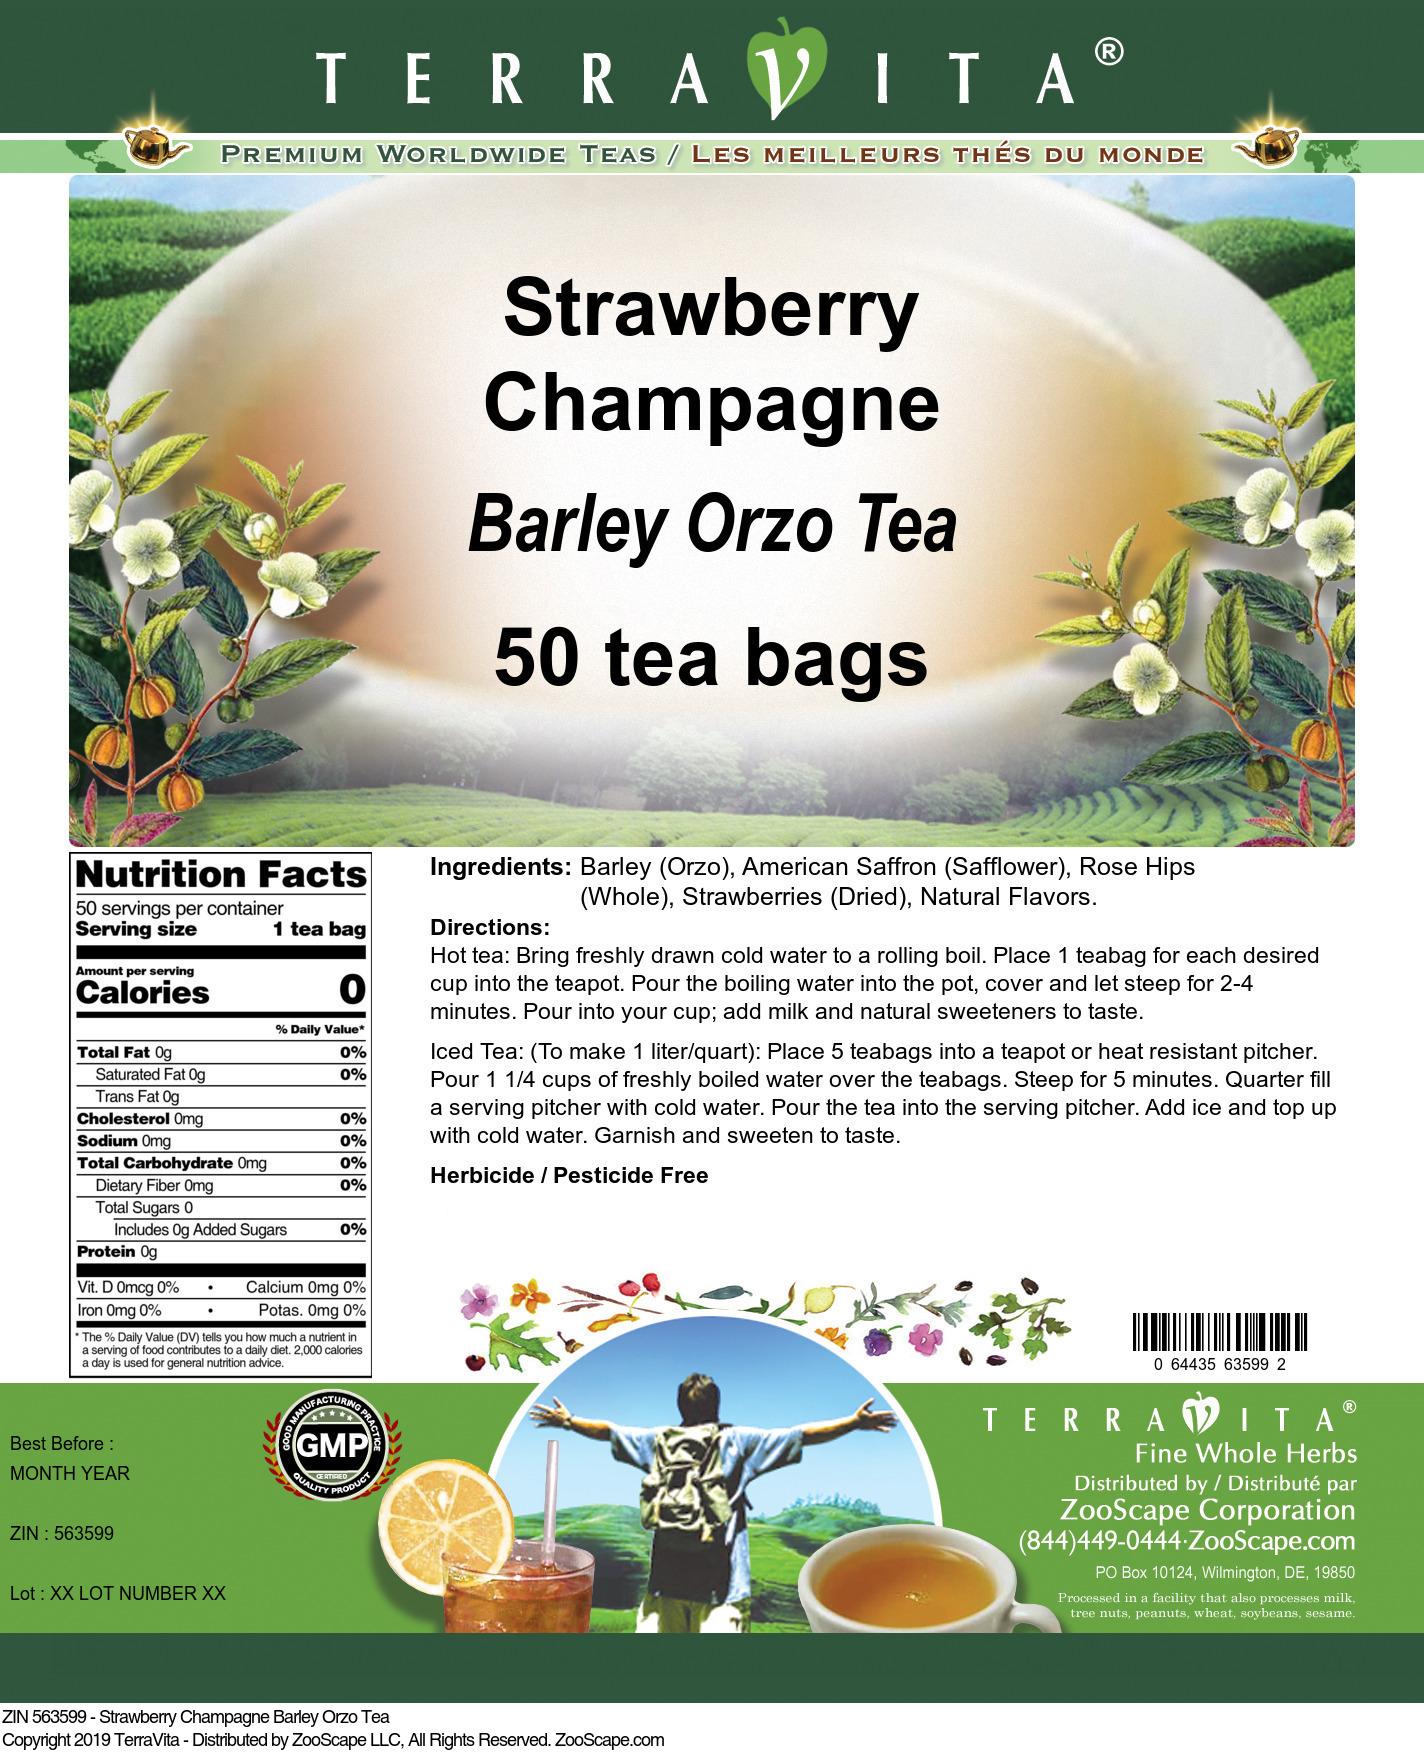 Strawberry Champagne Barley Orzo